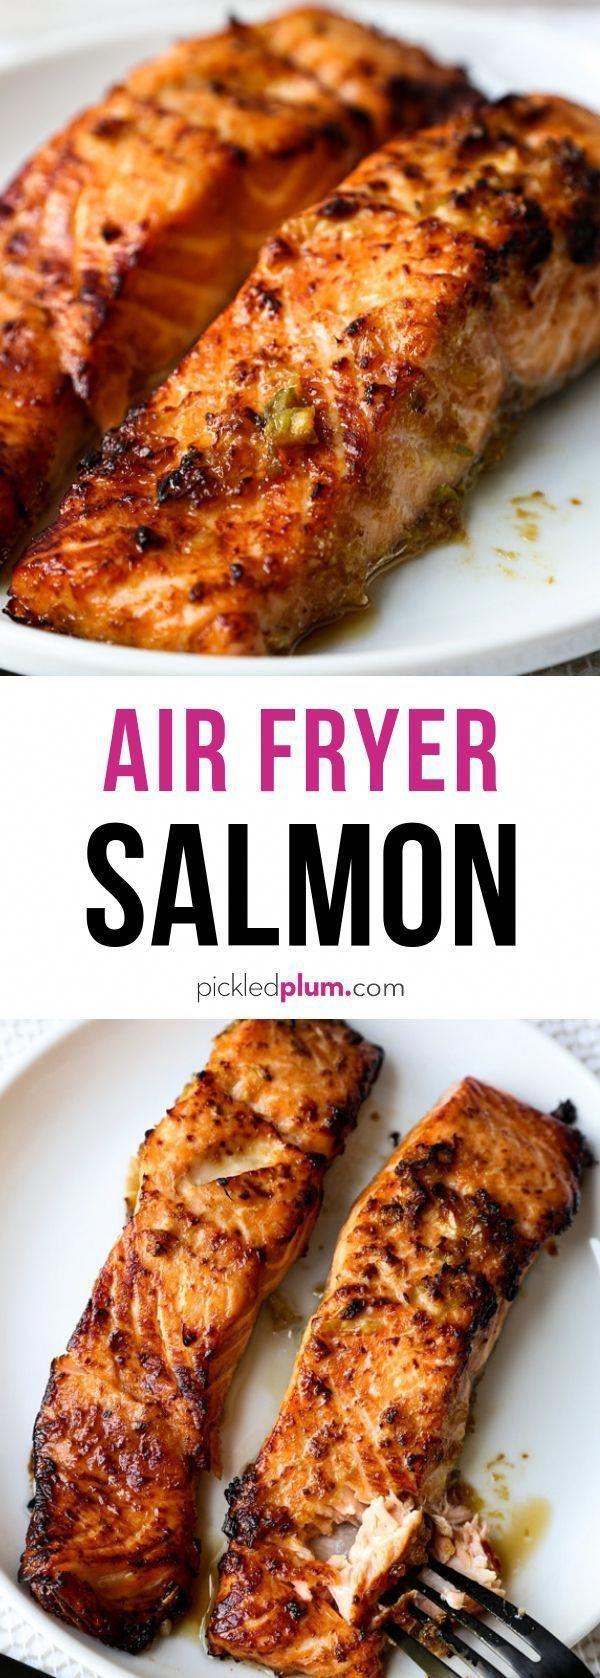 air fryer recipes frozen in 2020 Air fryer recipes